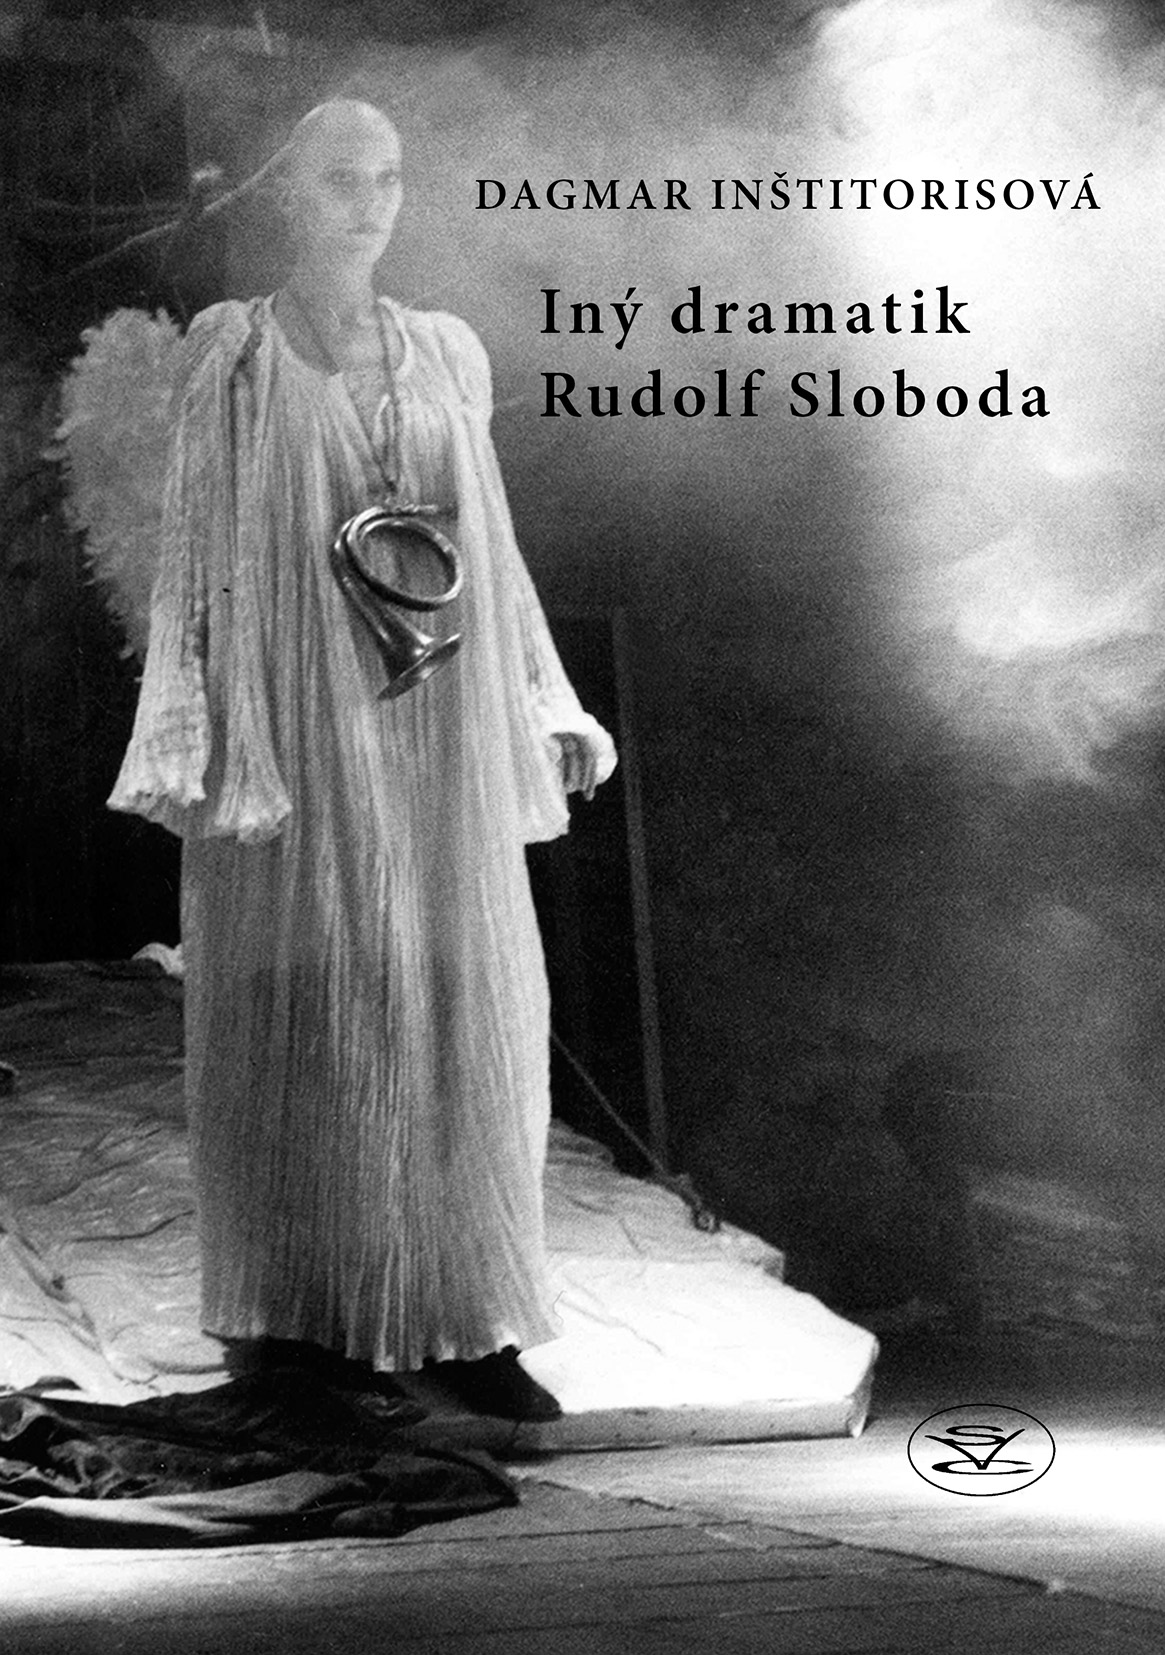 Iný dramatik Rudolf Sloboda